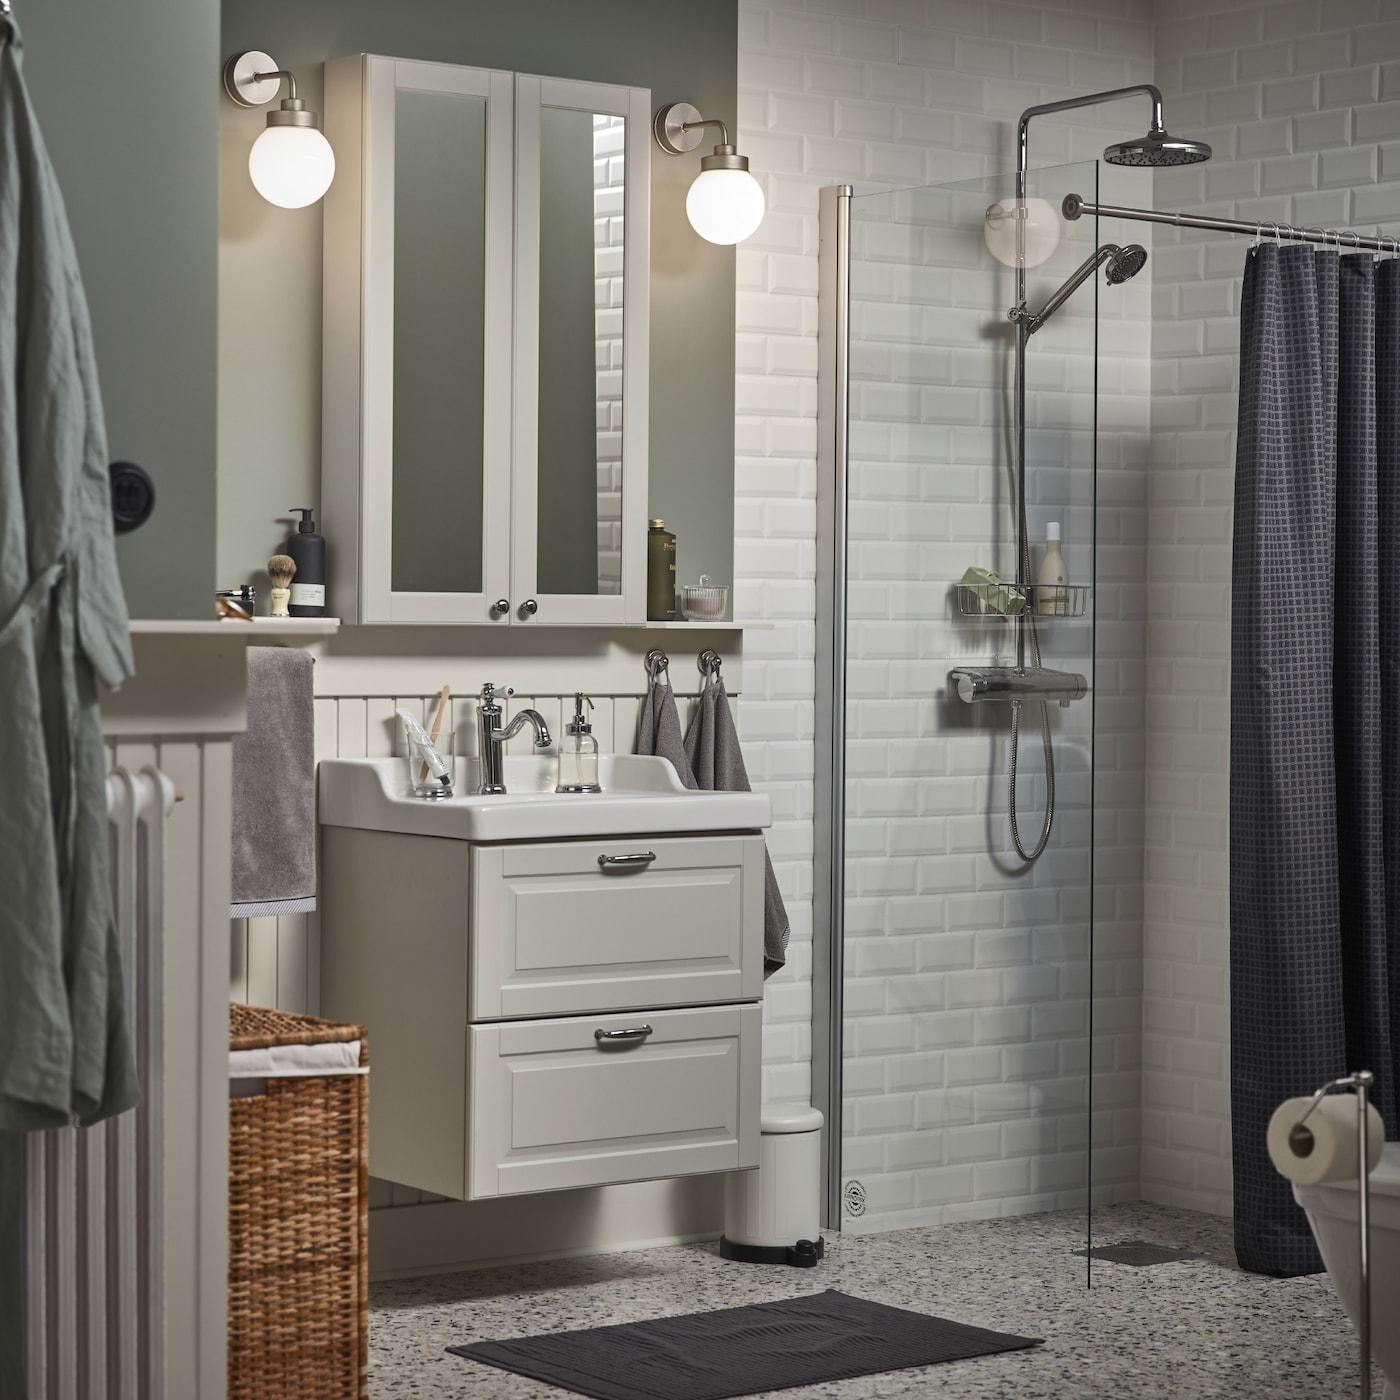 Ikea Mobili Bagno Pensili lasciati ispirare dai nostri bagni - ikea it